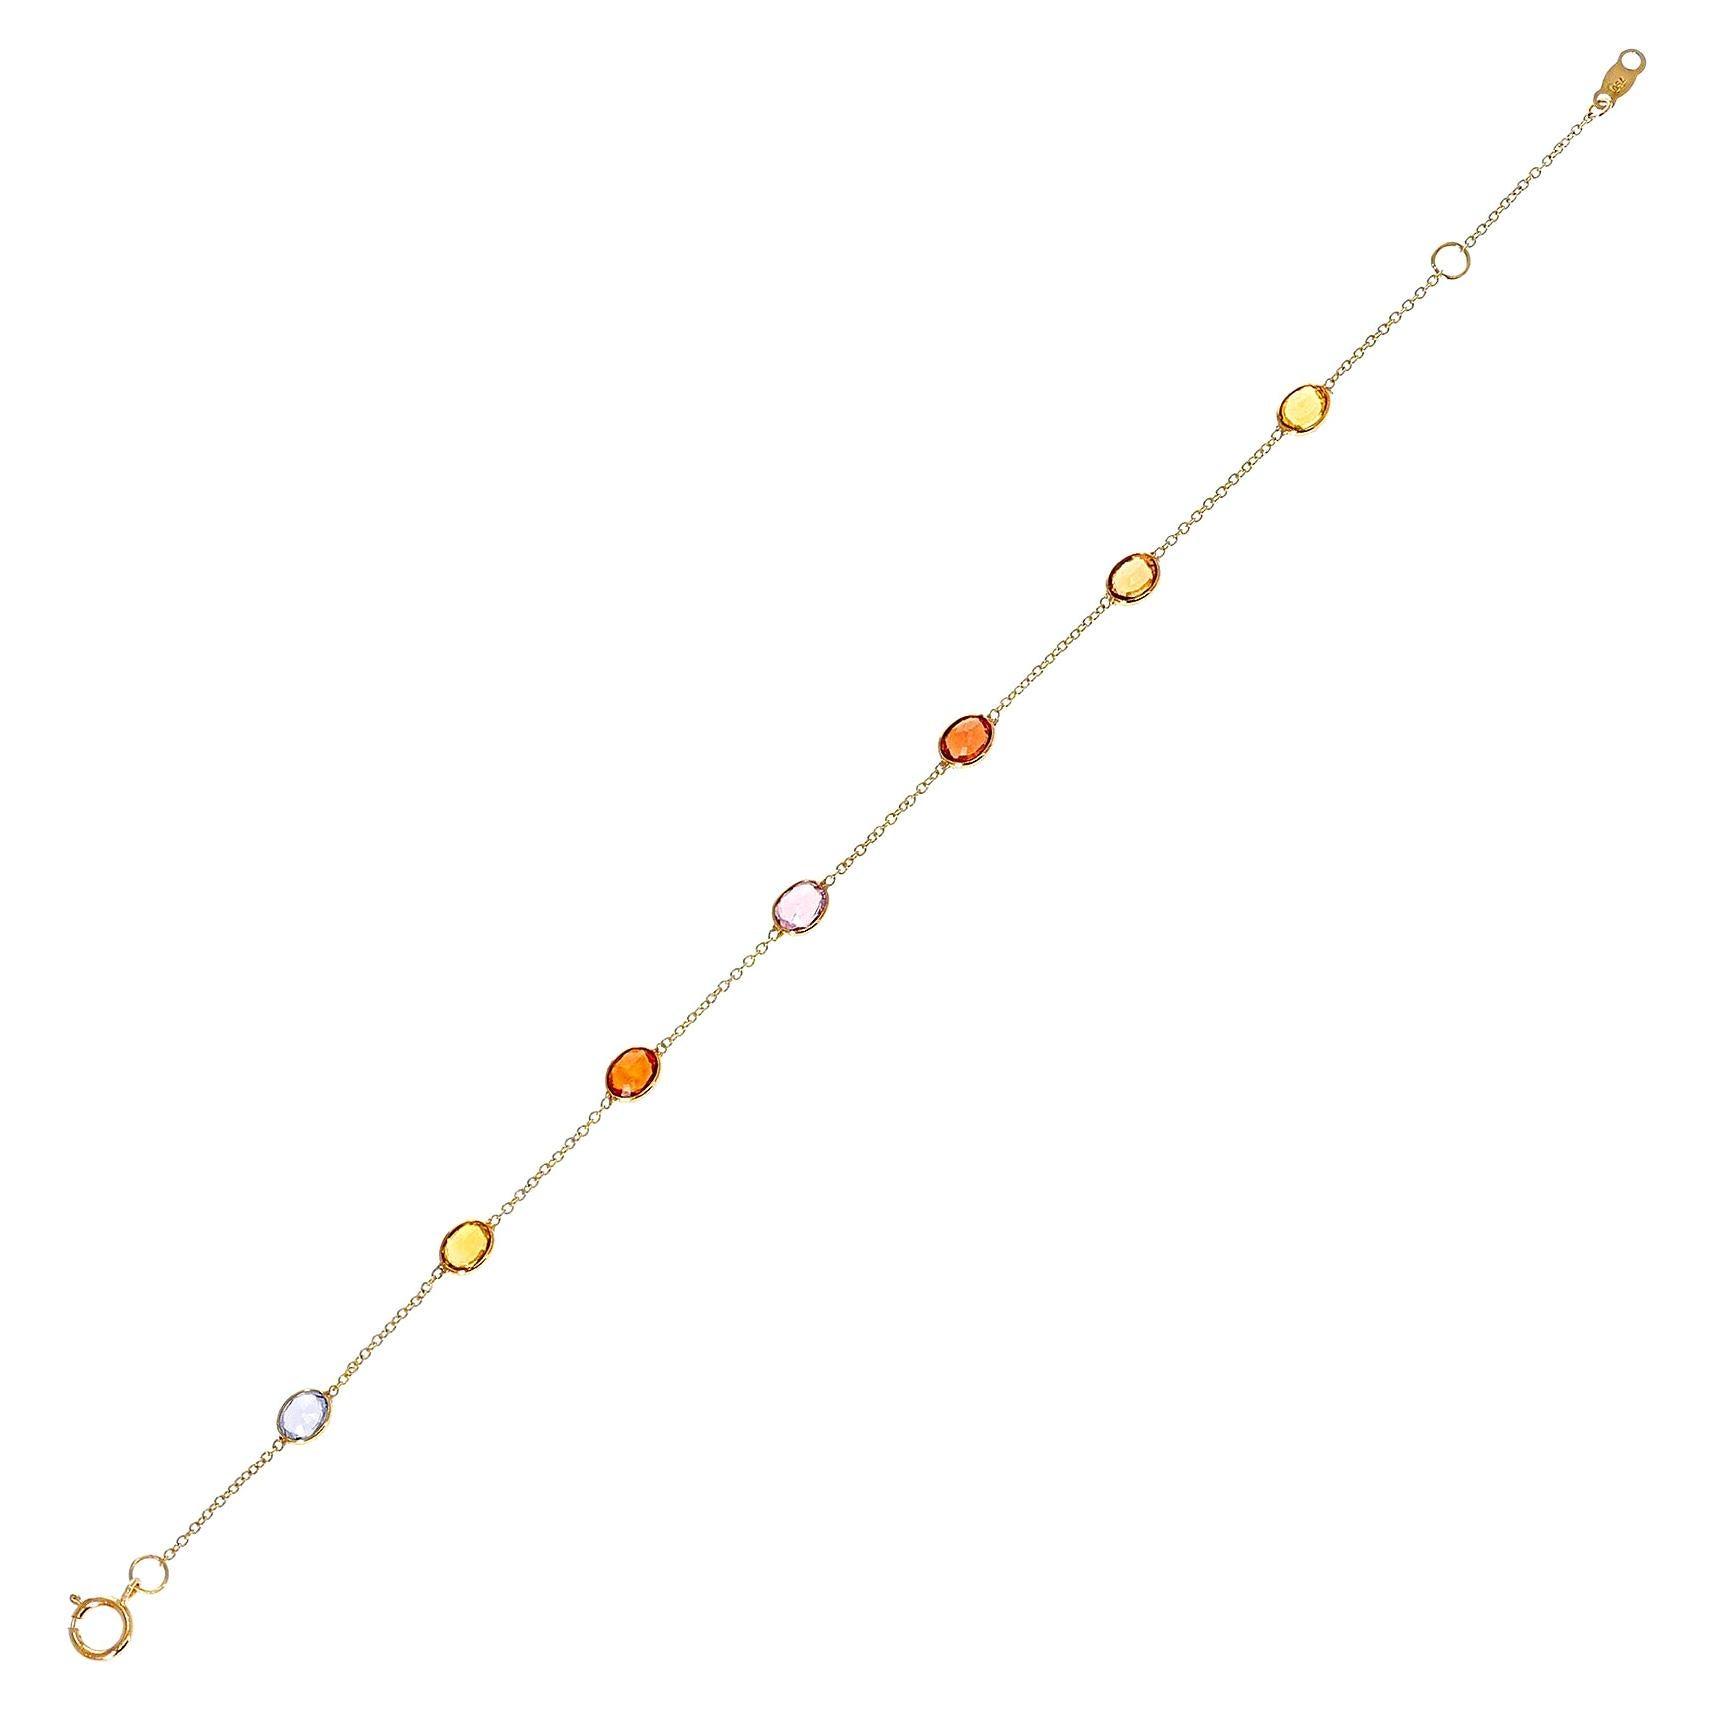 Oval Genuine Multi-Sapphire 18k Yellow Gold Bracelet